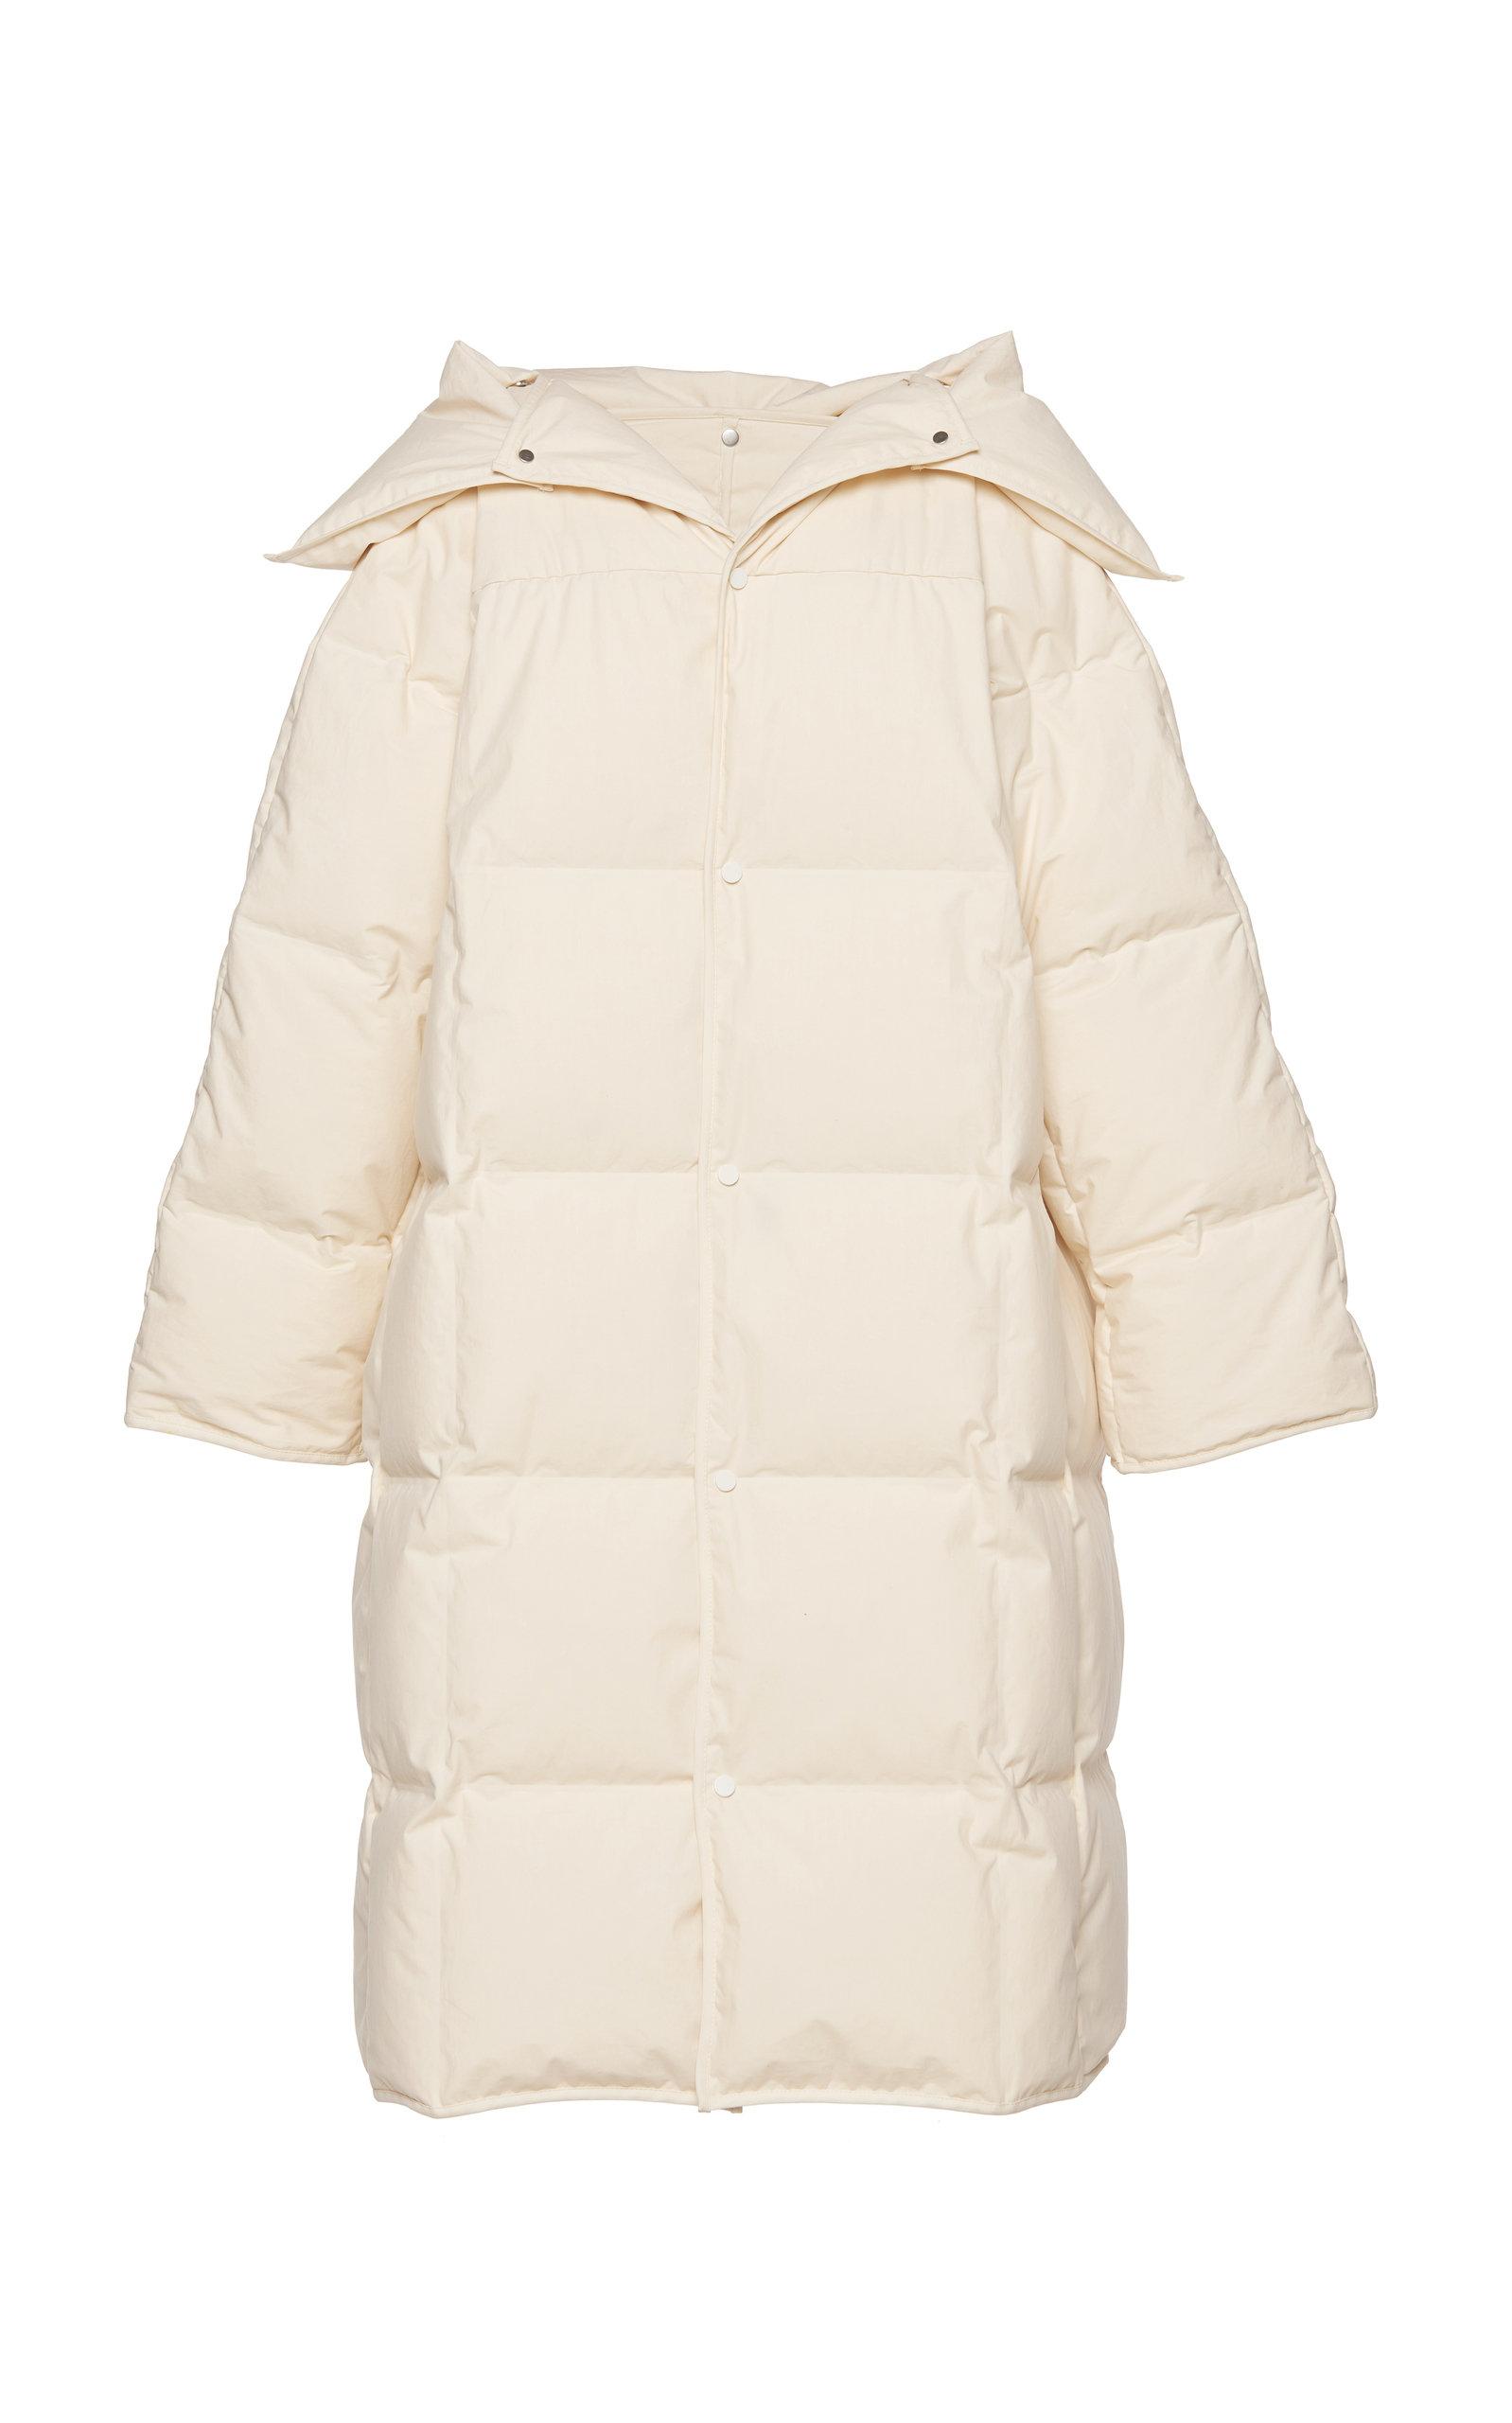 Bottega Veneta – Women's Oversized Cotton Puffer Coat  – White – Moda Operandi